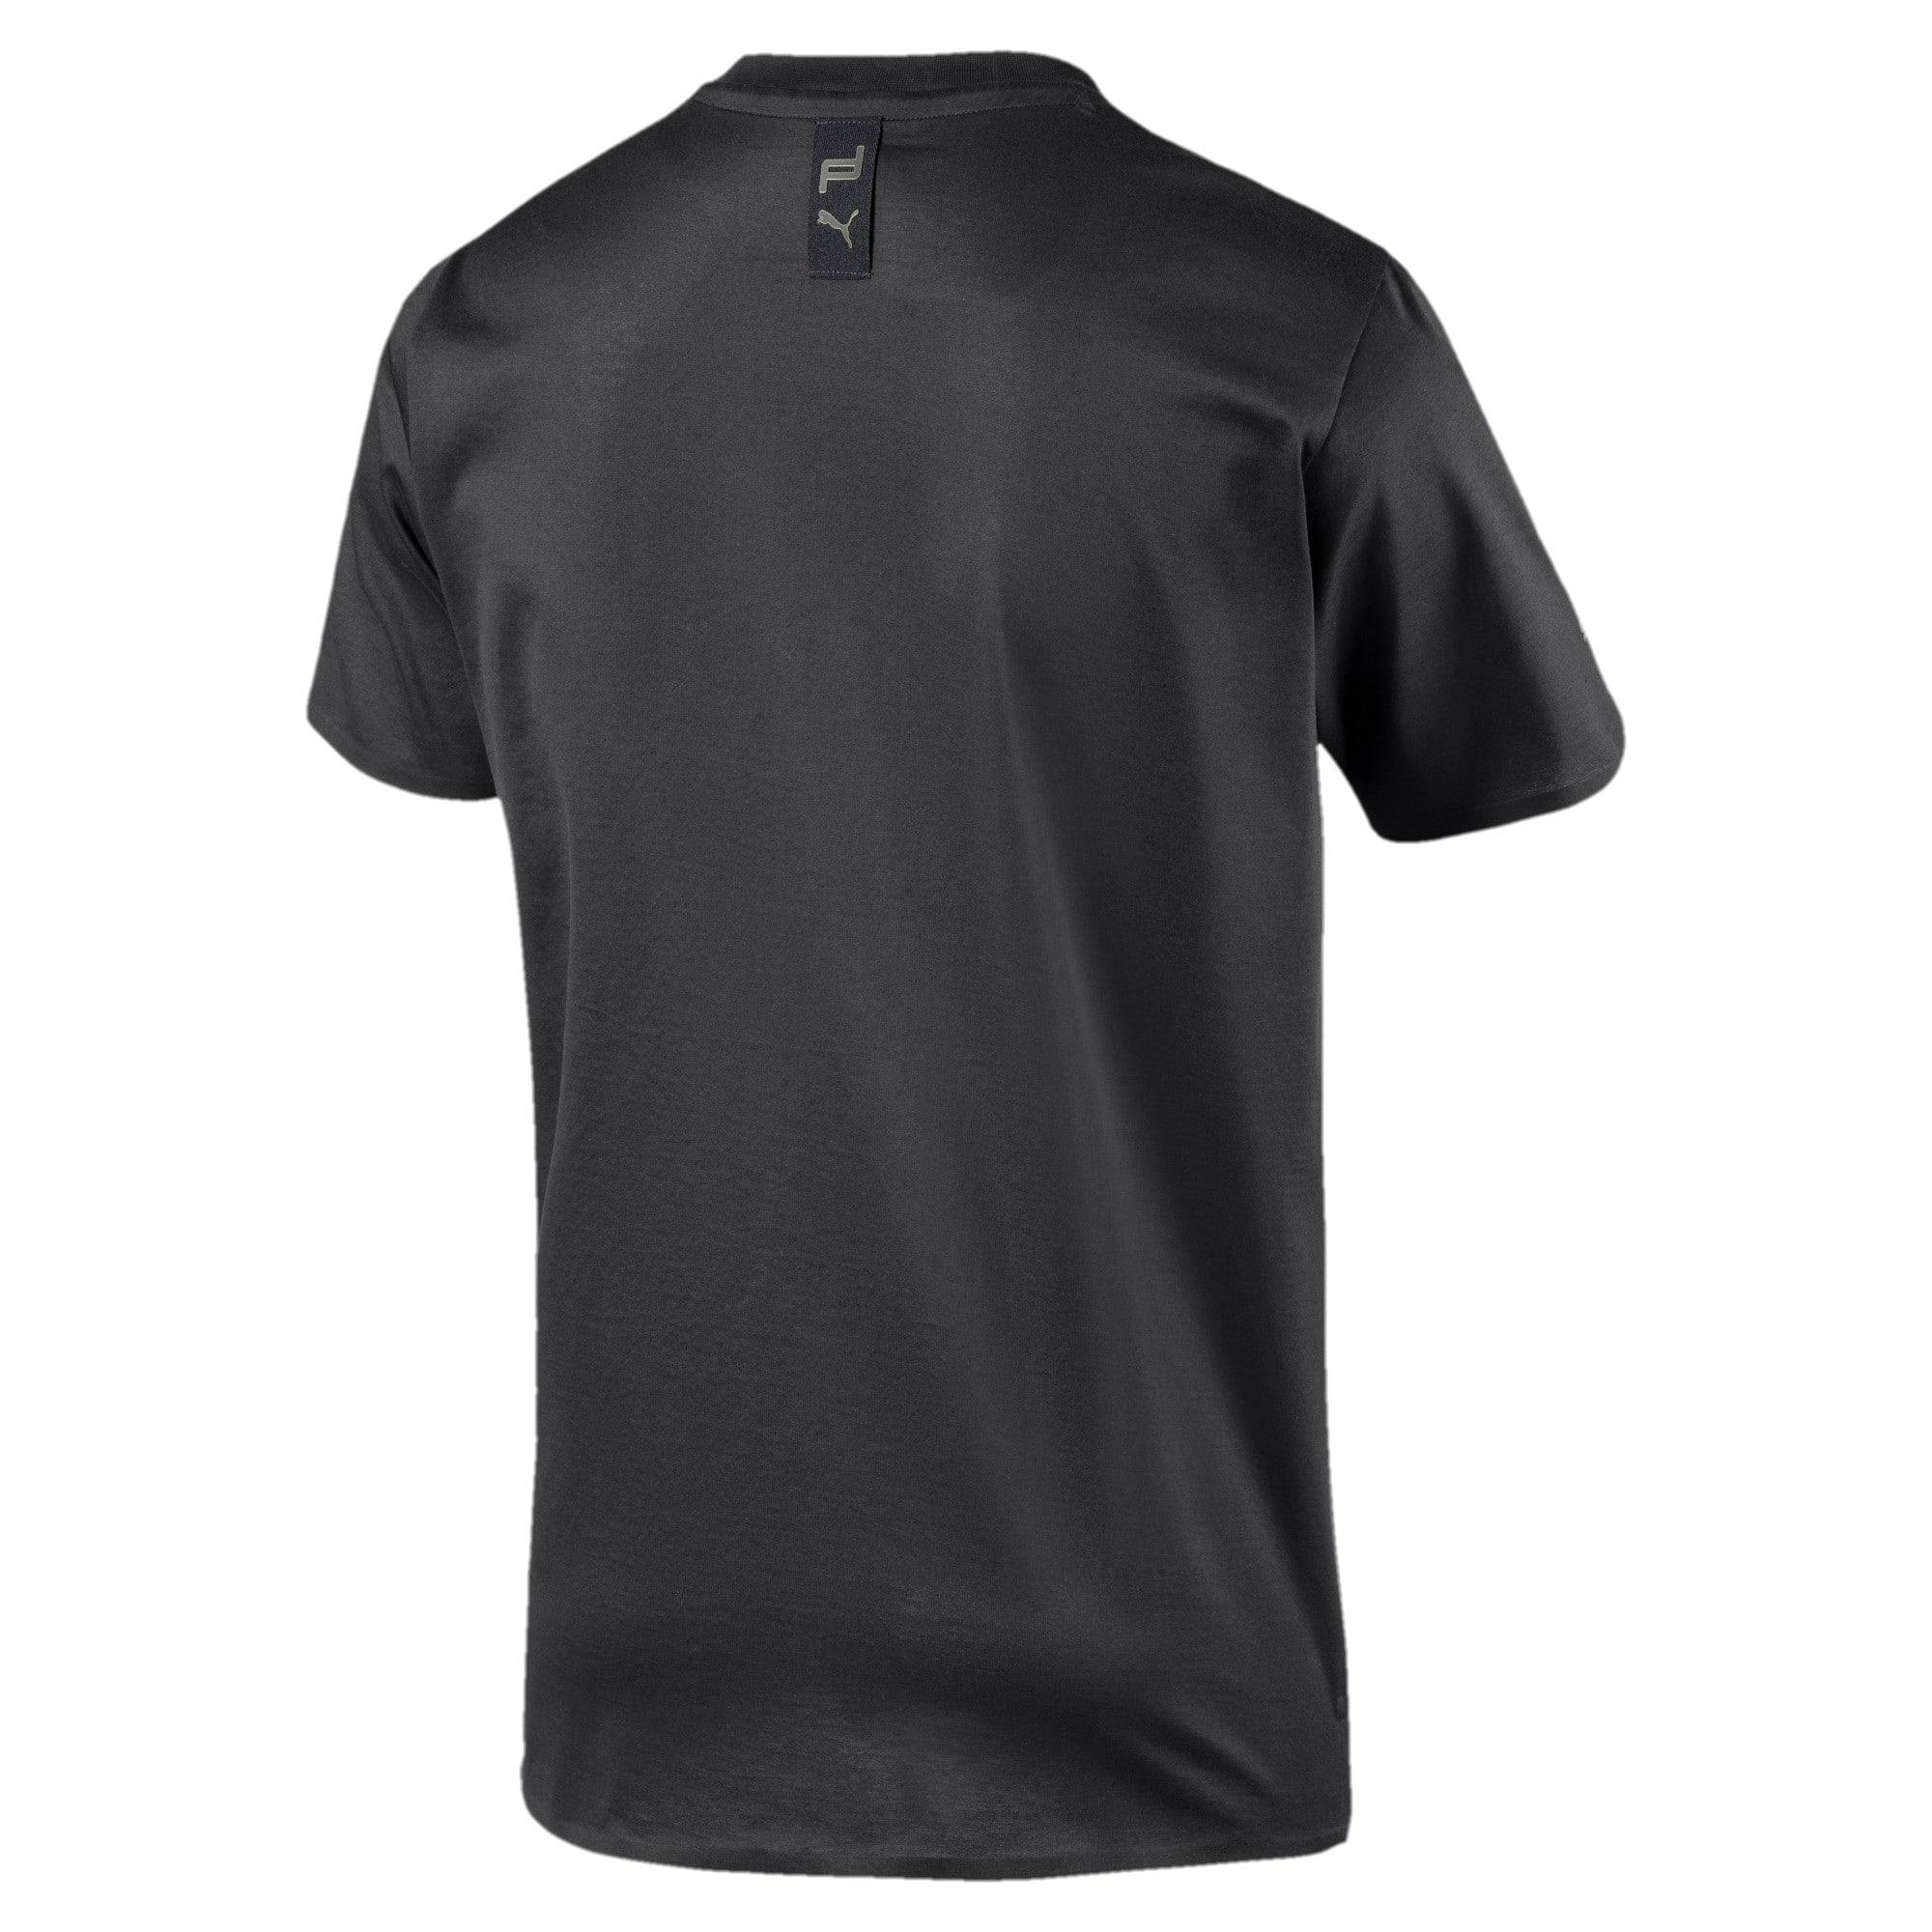 Thumbnail 2 of M ポルシェデザイン PD グラフィック Tシャツ, Jet Black, medium-JPN